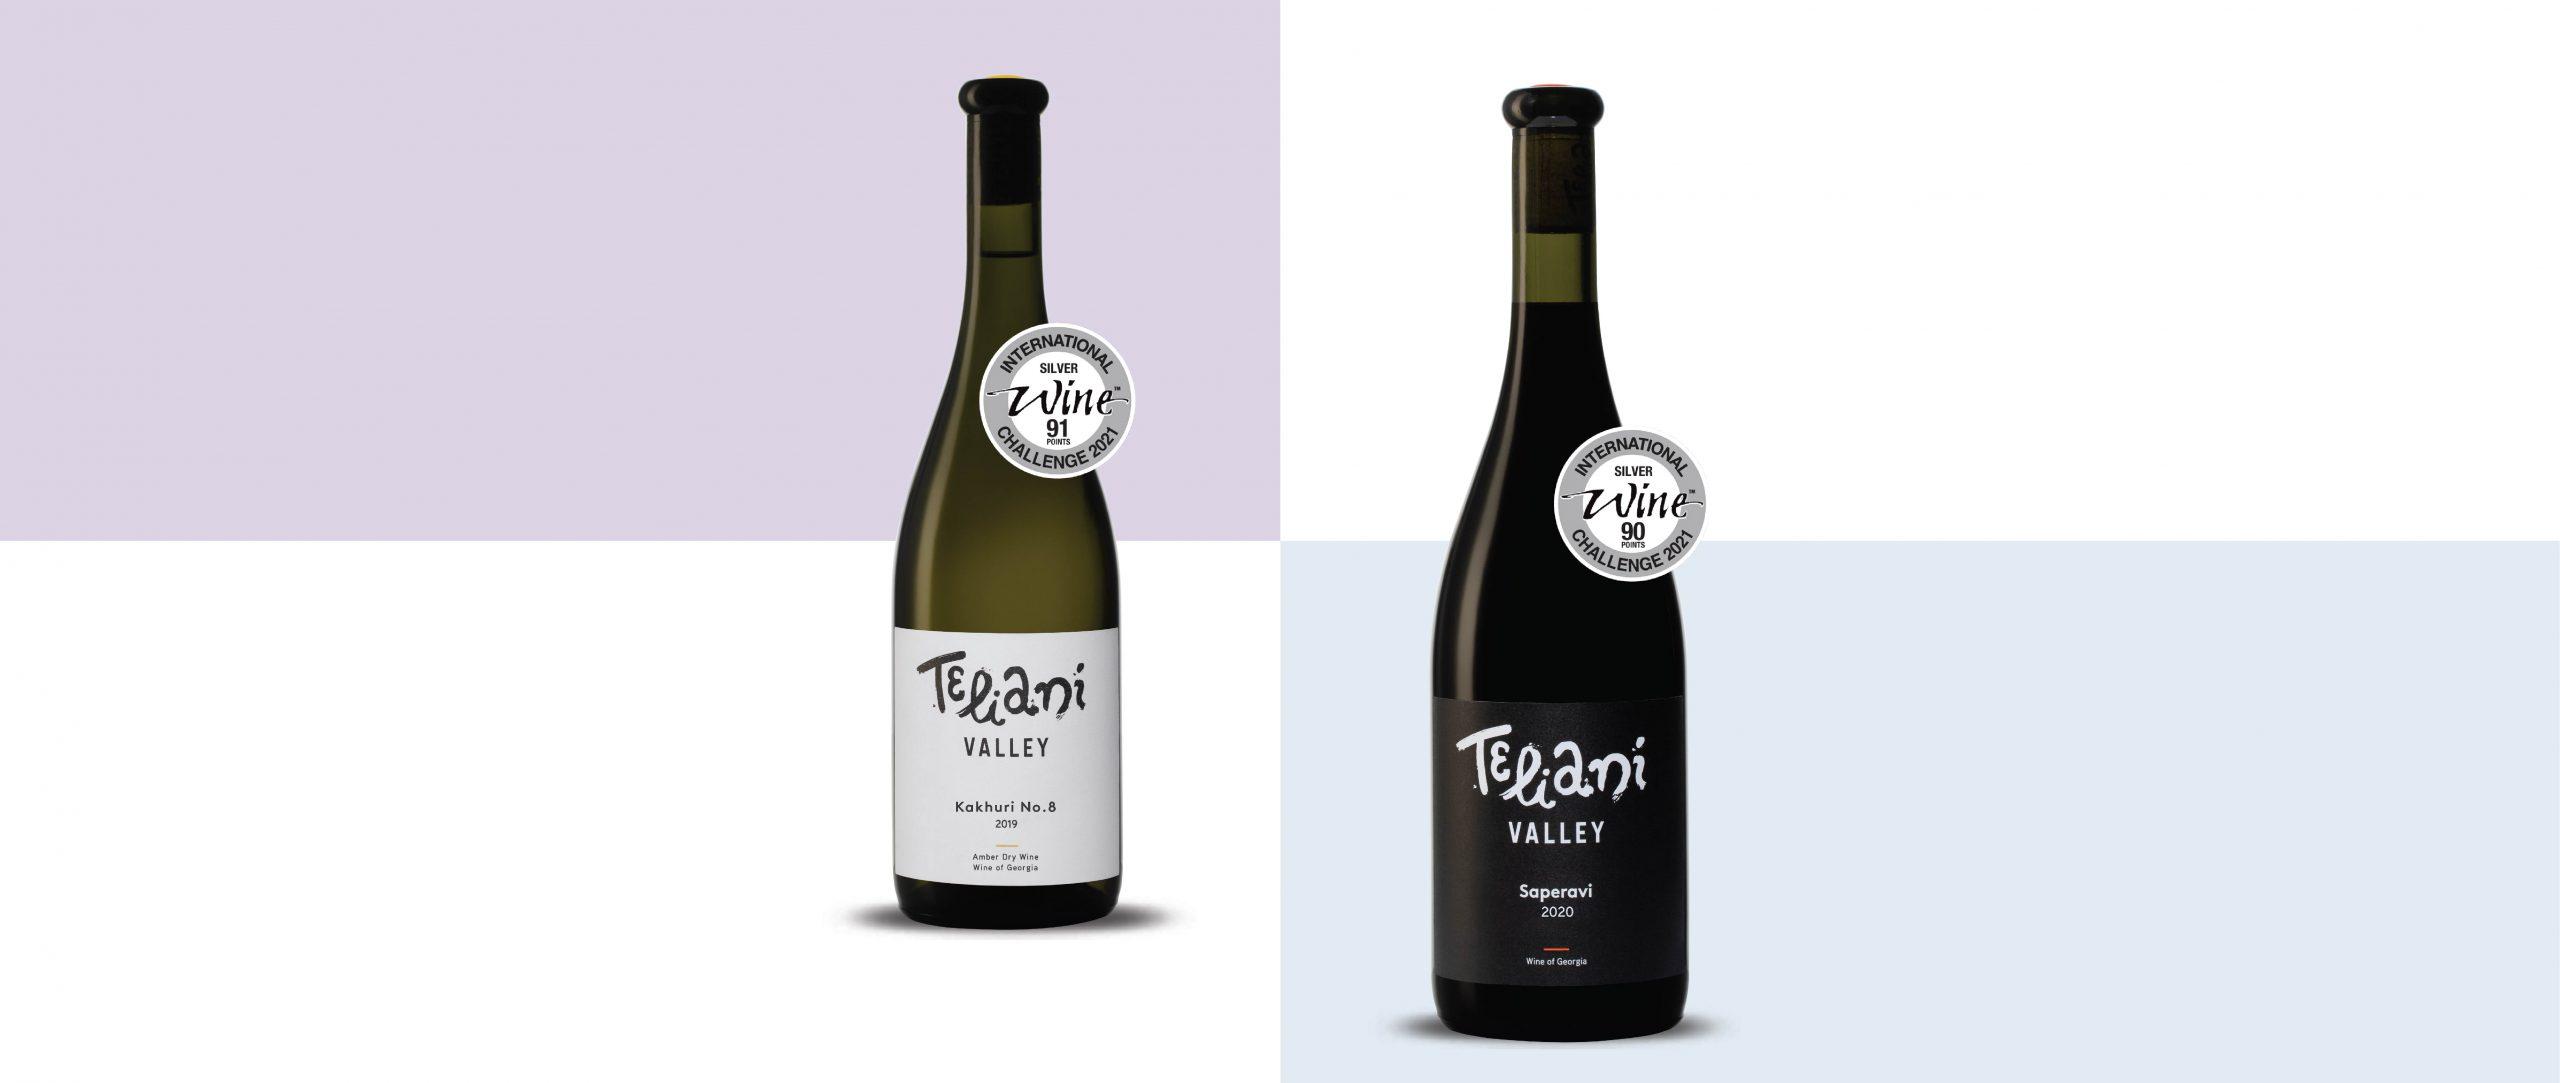 Teliani Valley success at International Wine Challange 2021